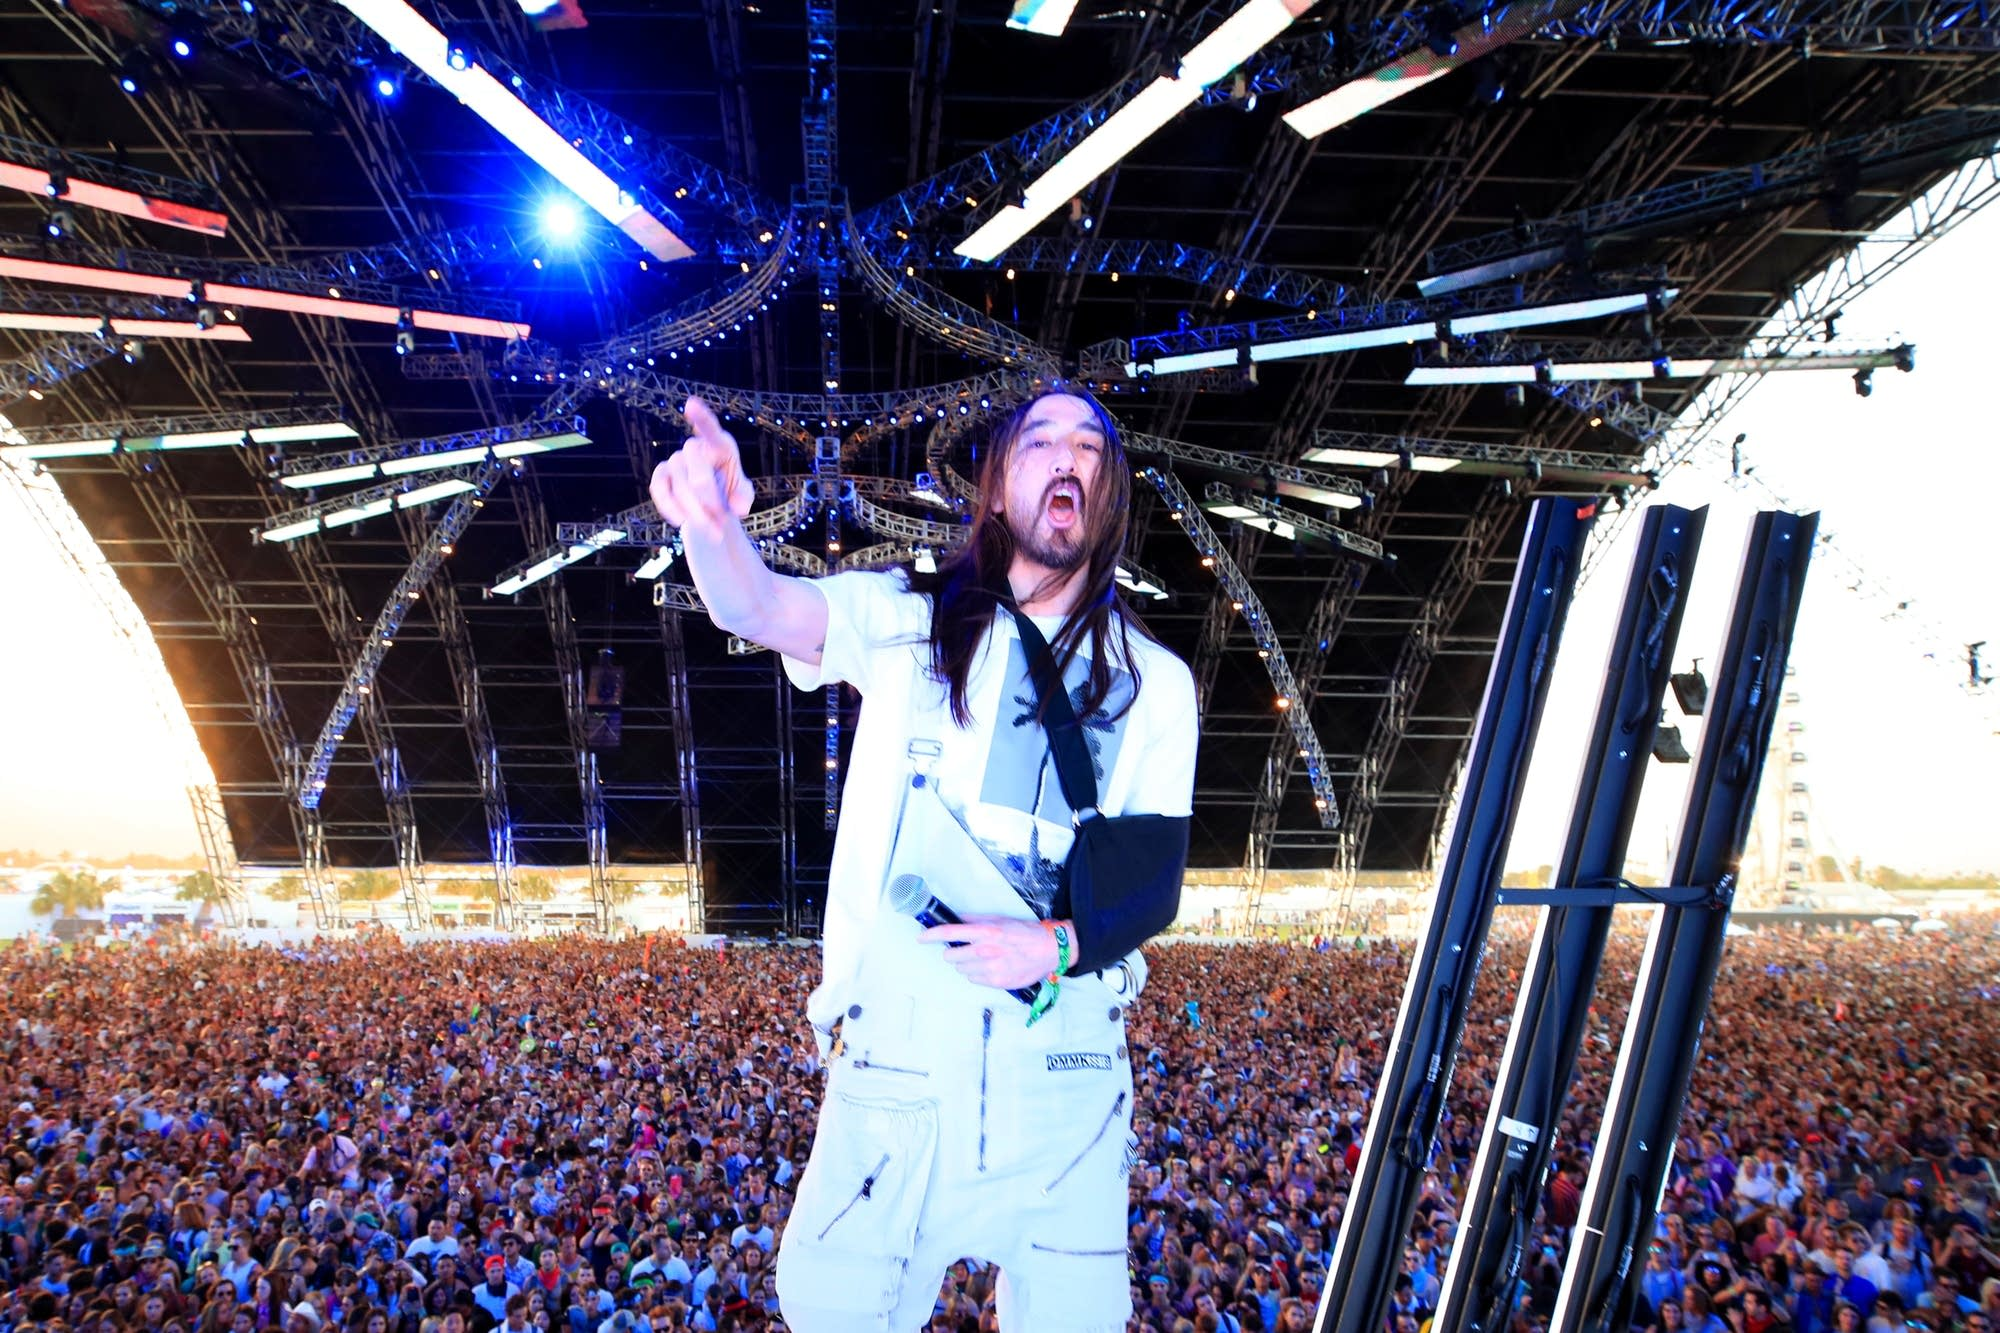 Steve Aoki performs at Coachella